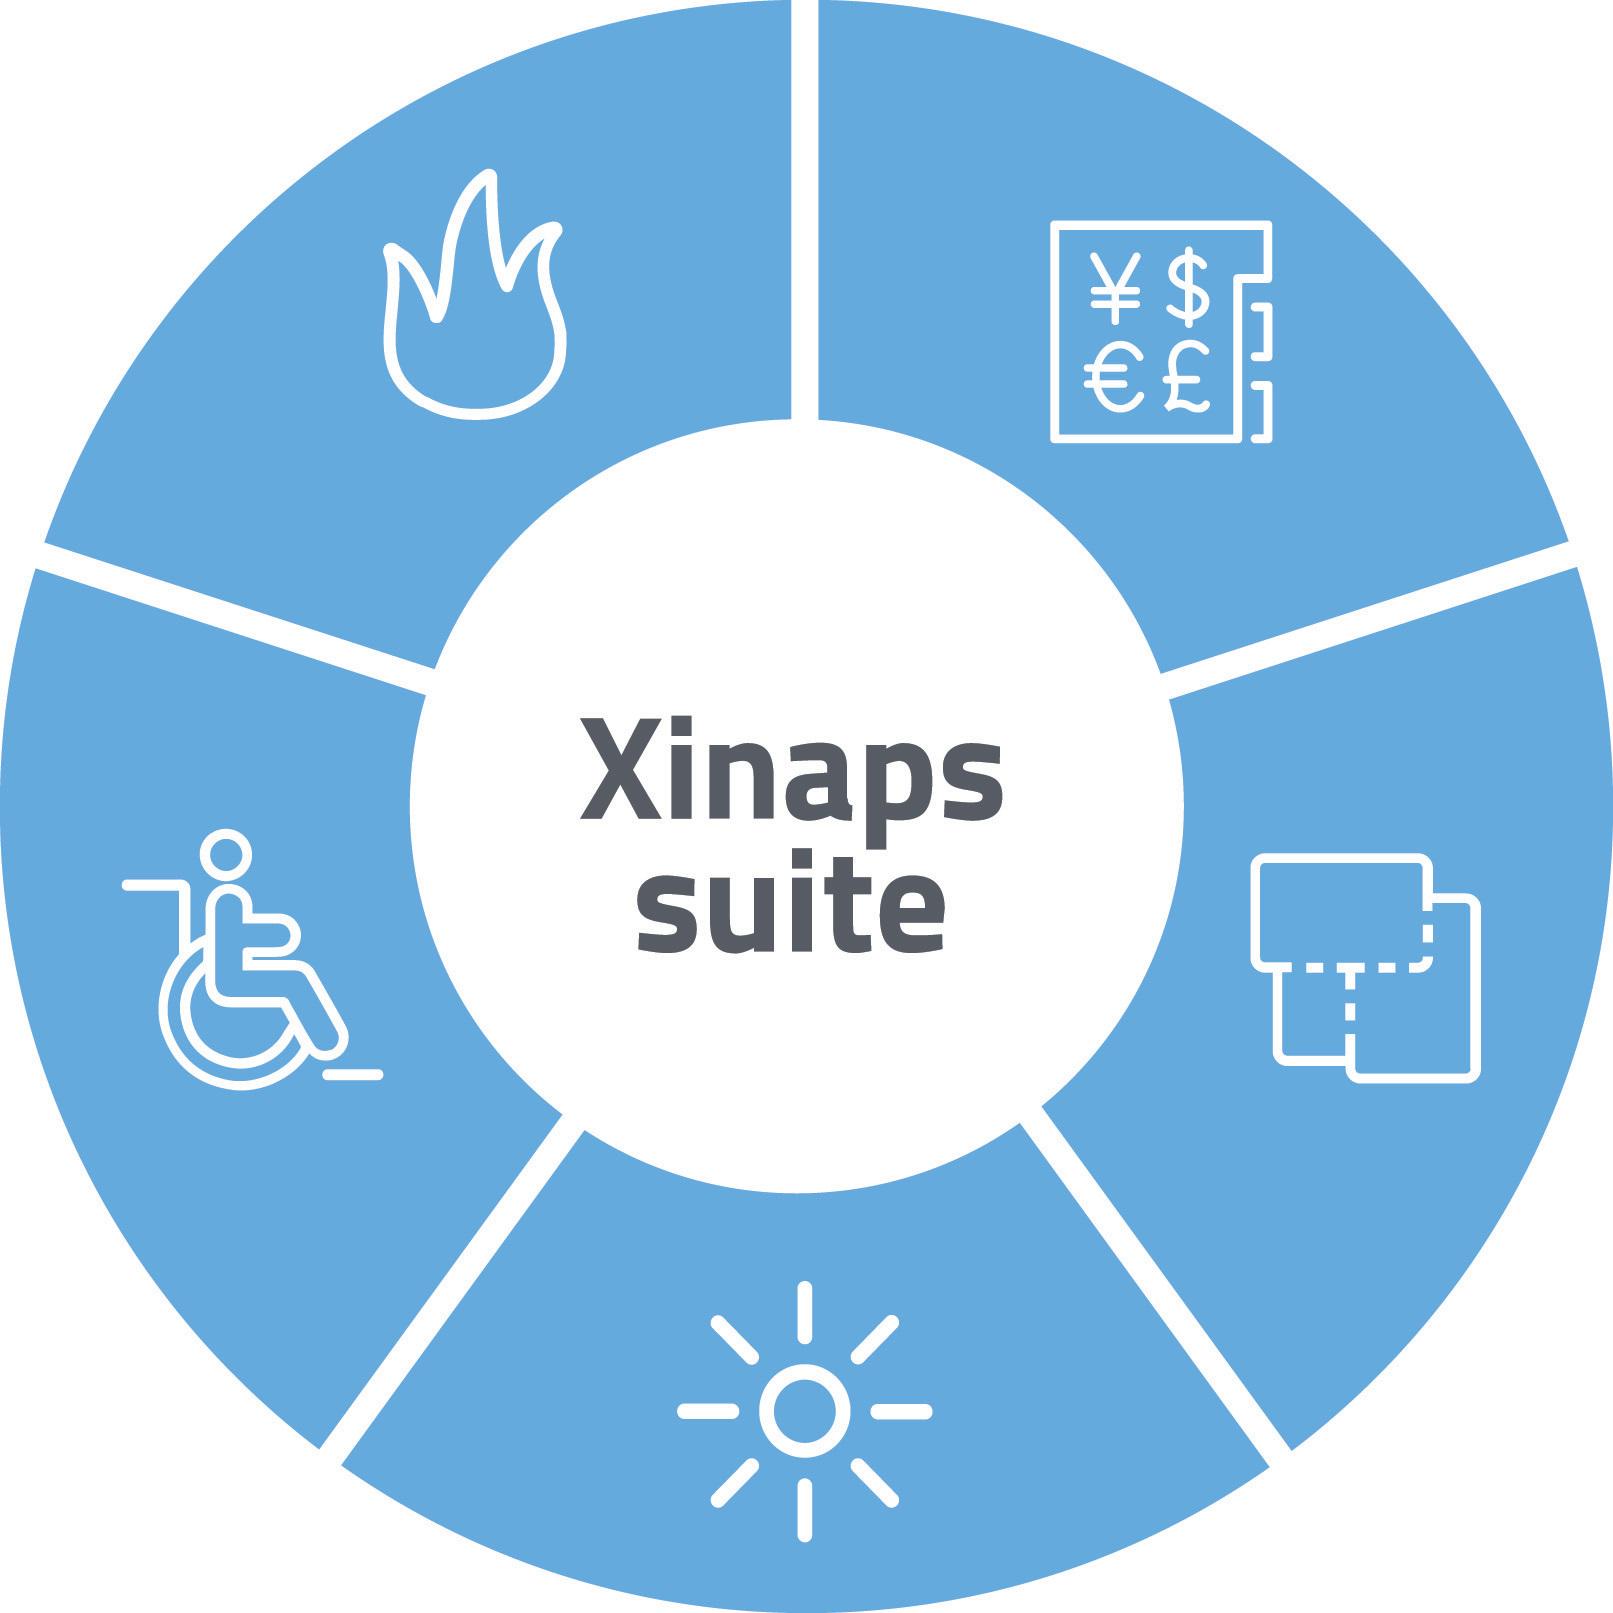 Xinaps suite graphic